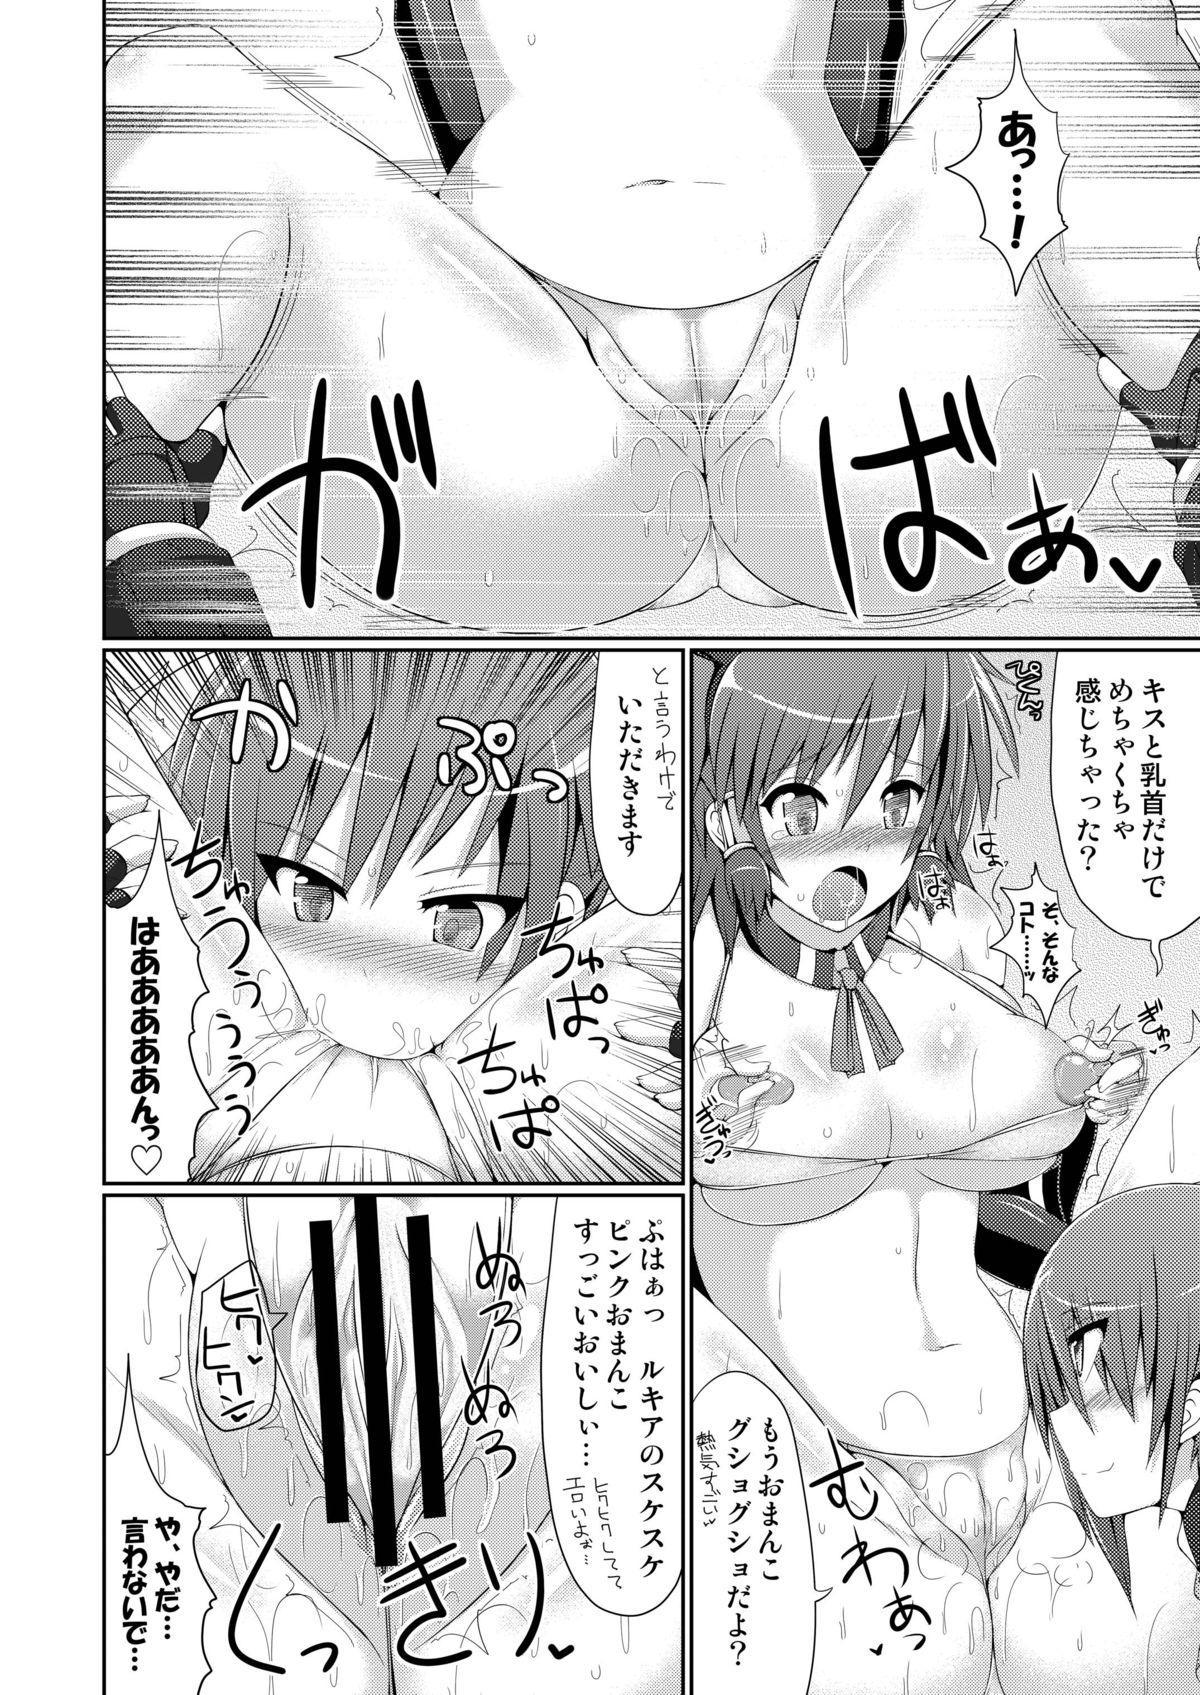 Stapspats QMA Soushuuhen 1: Marugoto Issatsu! Ruquia Hon!! 149